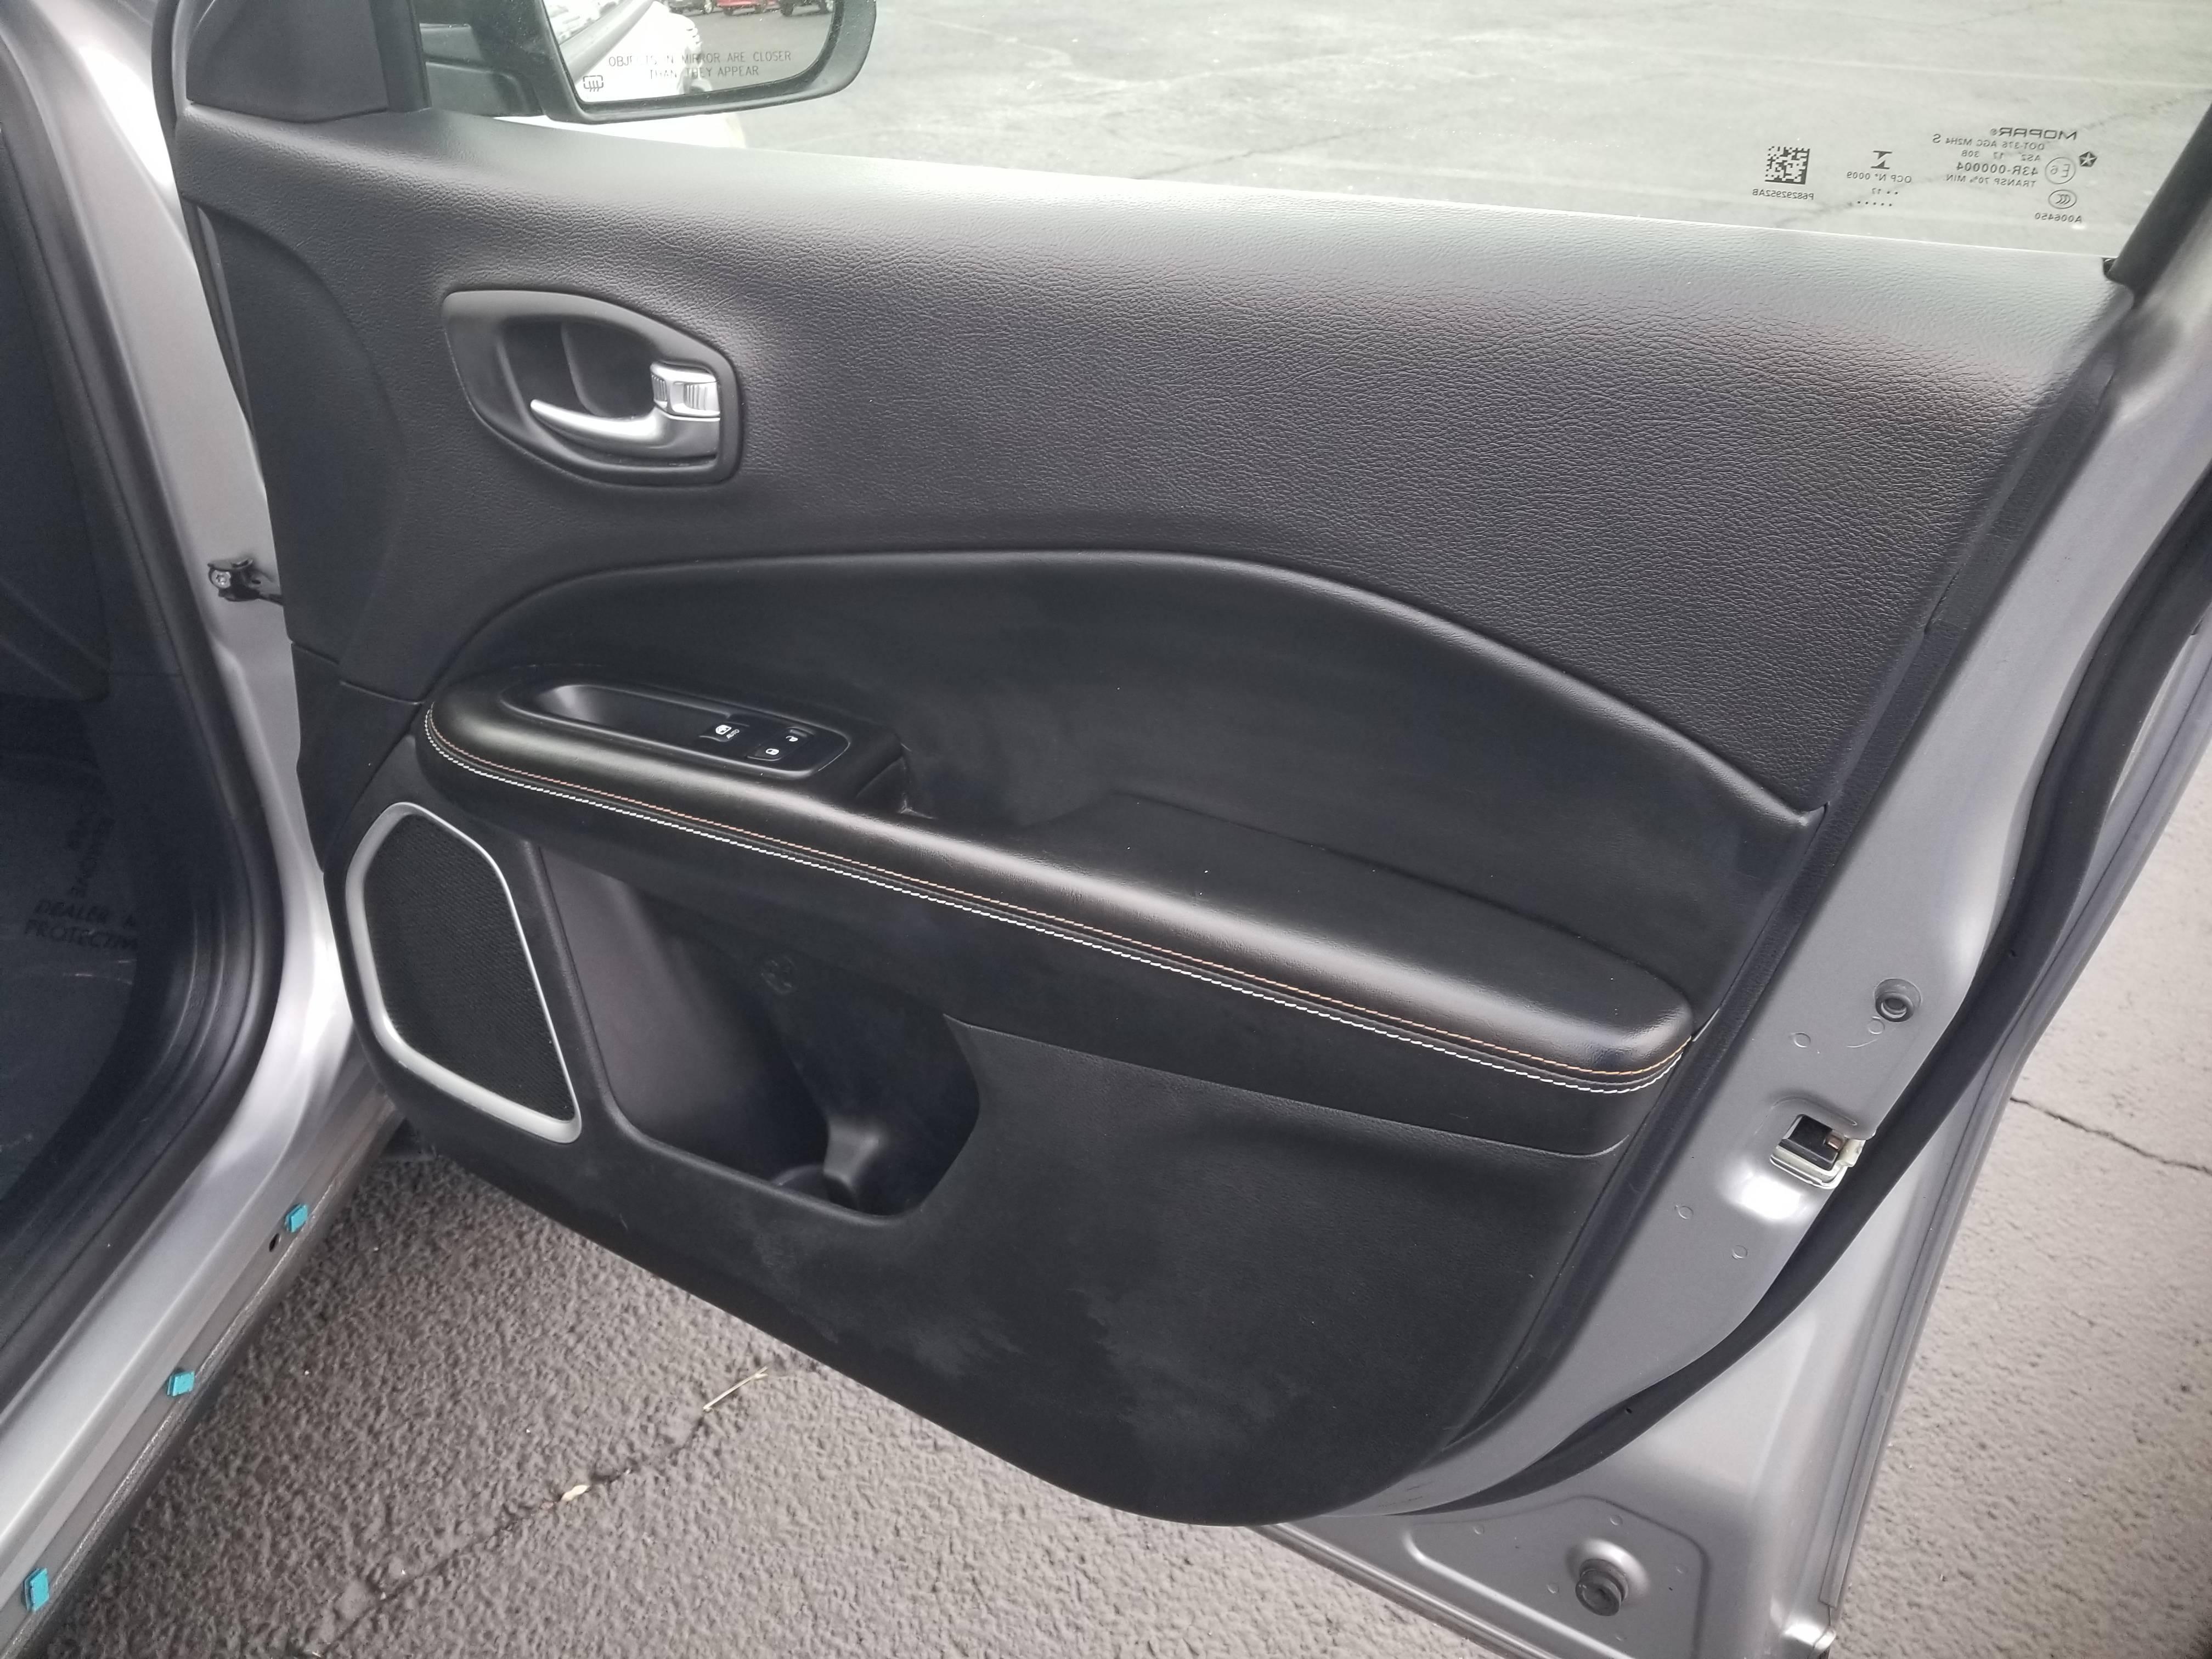 used vehicle - SUV JEEP COMPASS 2017